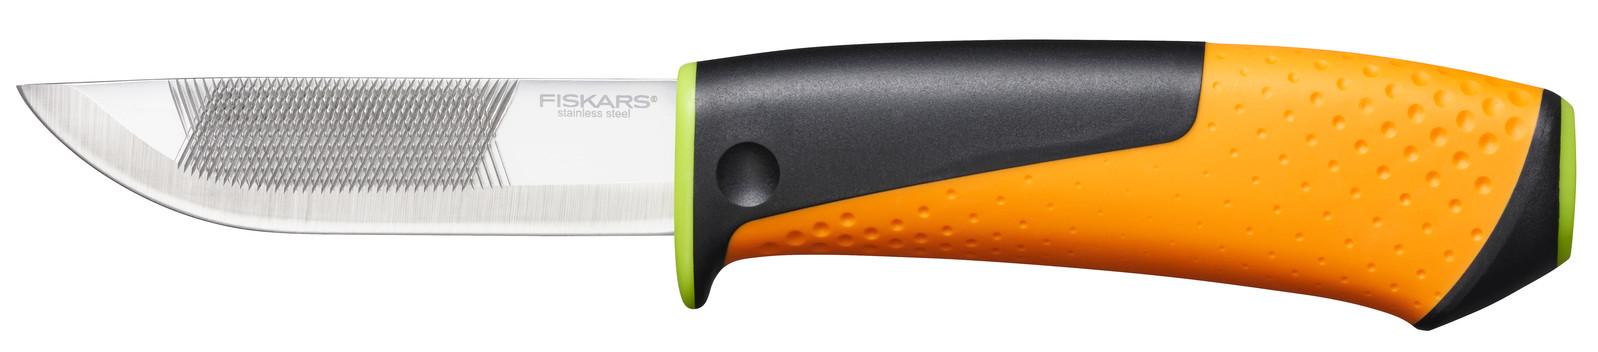 Fiskars Нож  для тяжелых работ с точилкой Hardware, 219мм, 150г